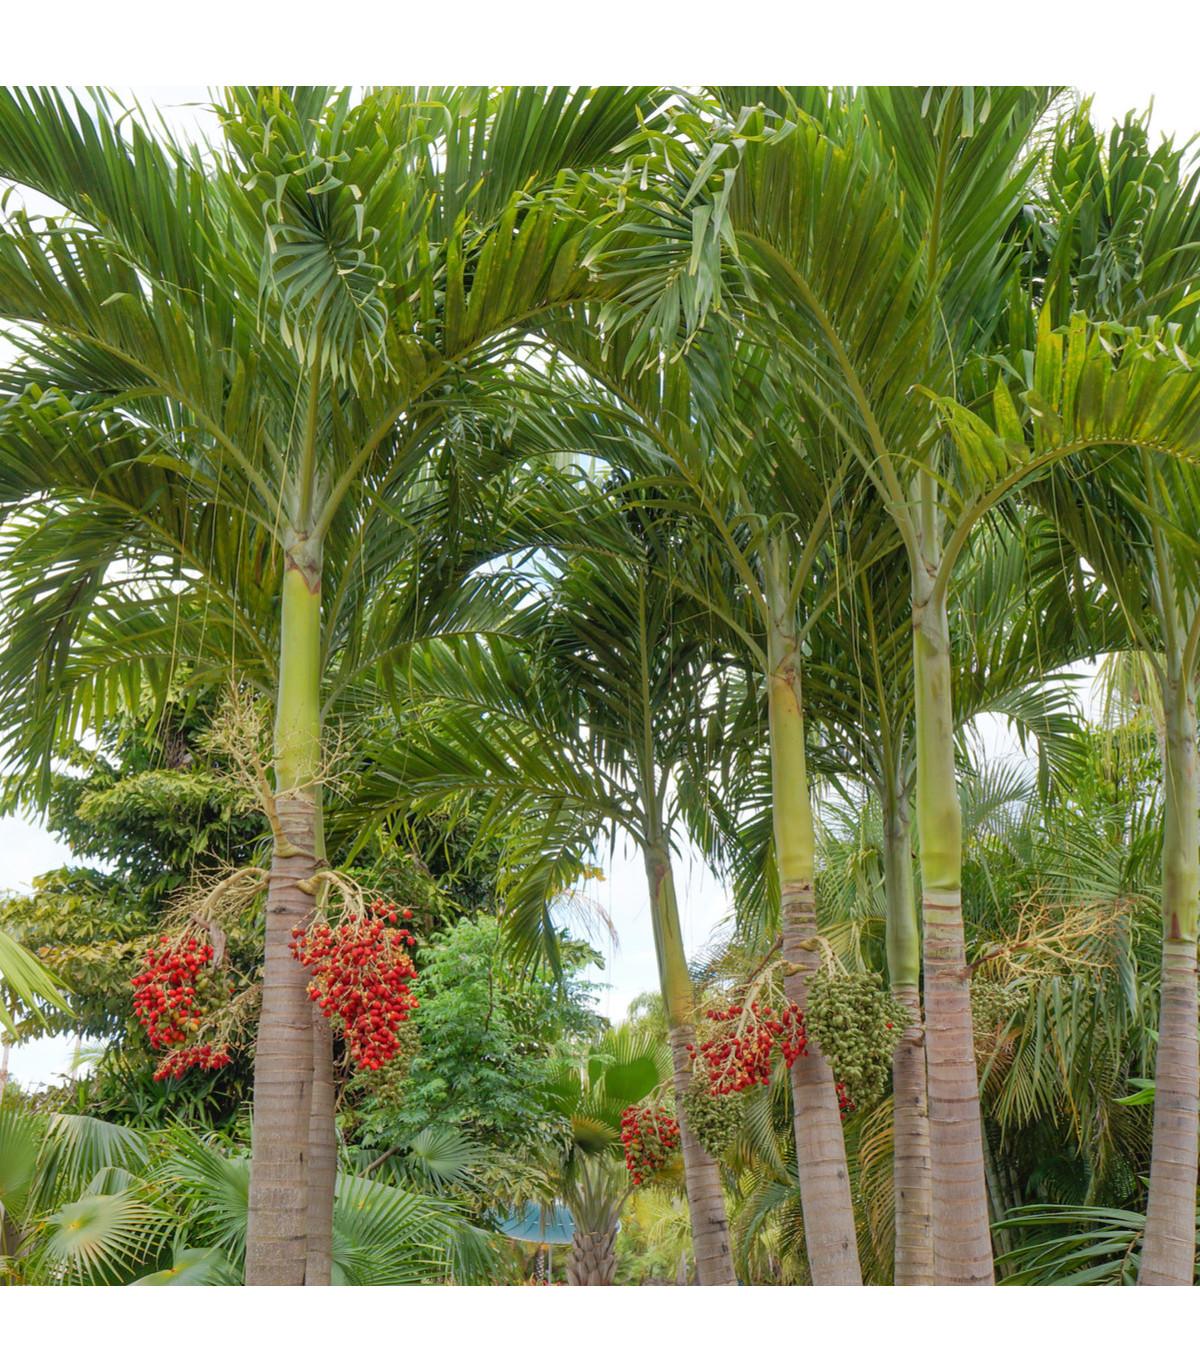 Palma vánoční - Adonidia merrillii - semena palem - 2 ks